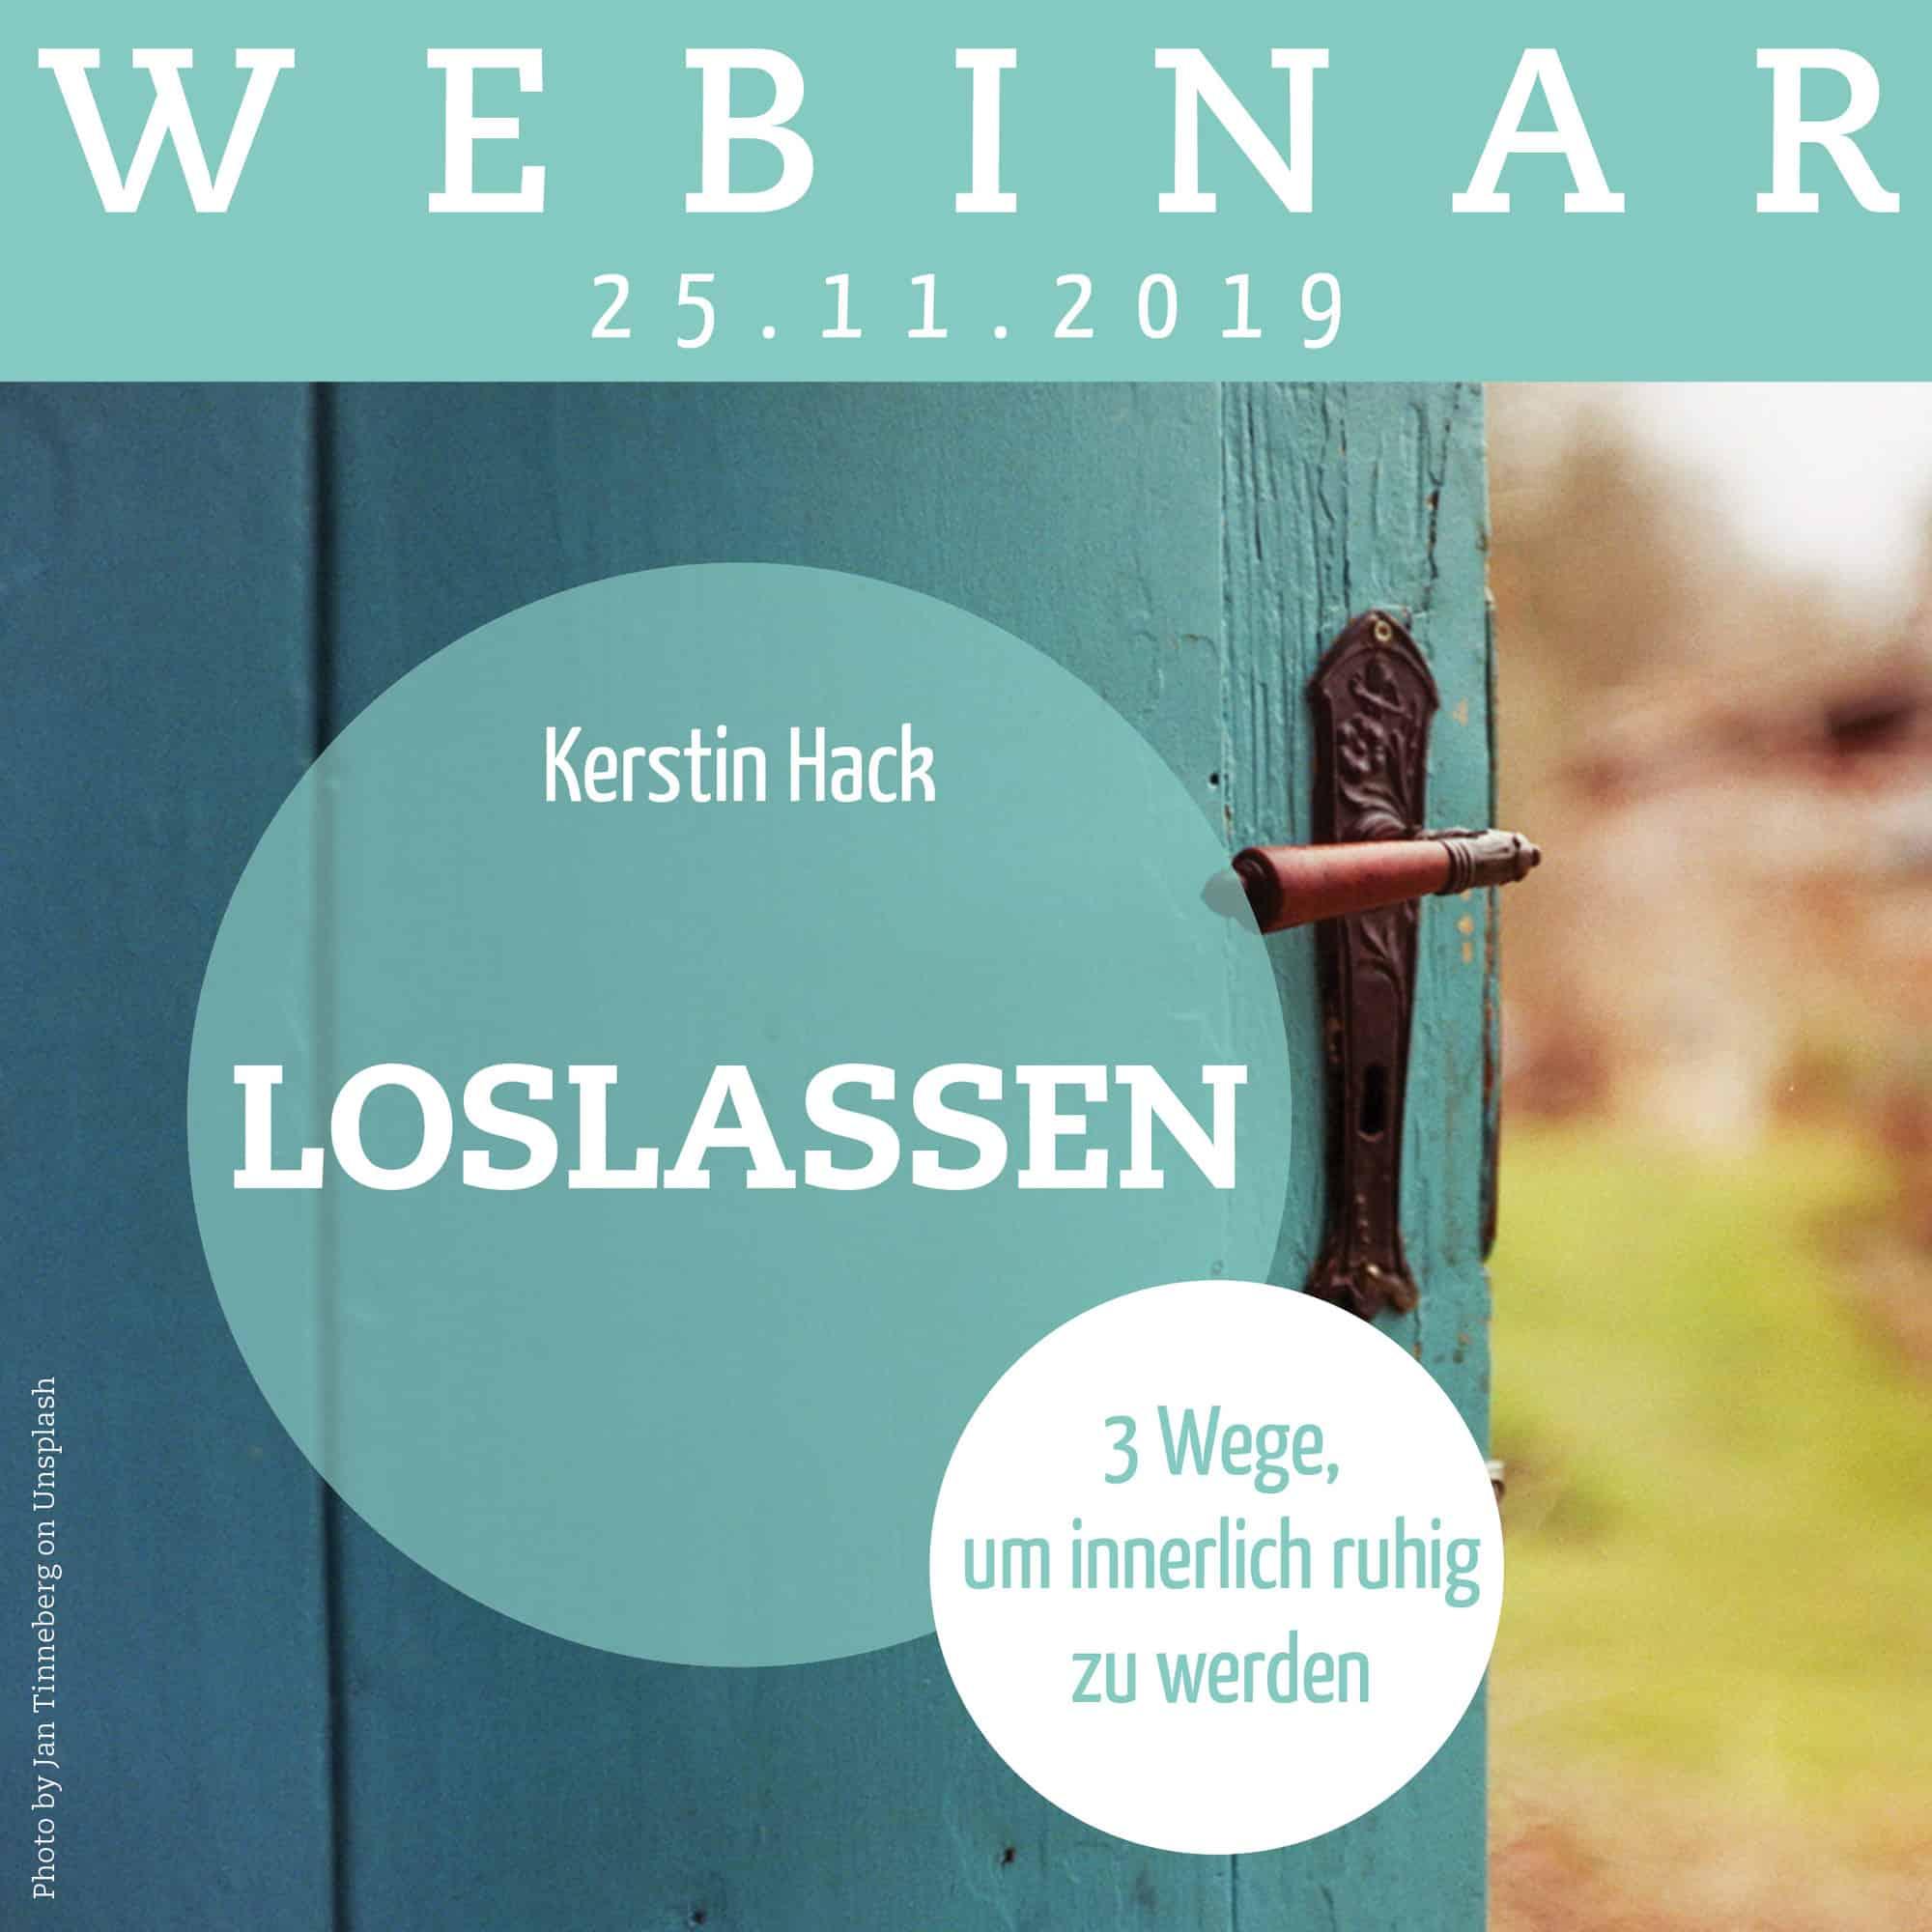 Webinar mit Coach Kerstin Hack: Loslassen. Am 25.11.